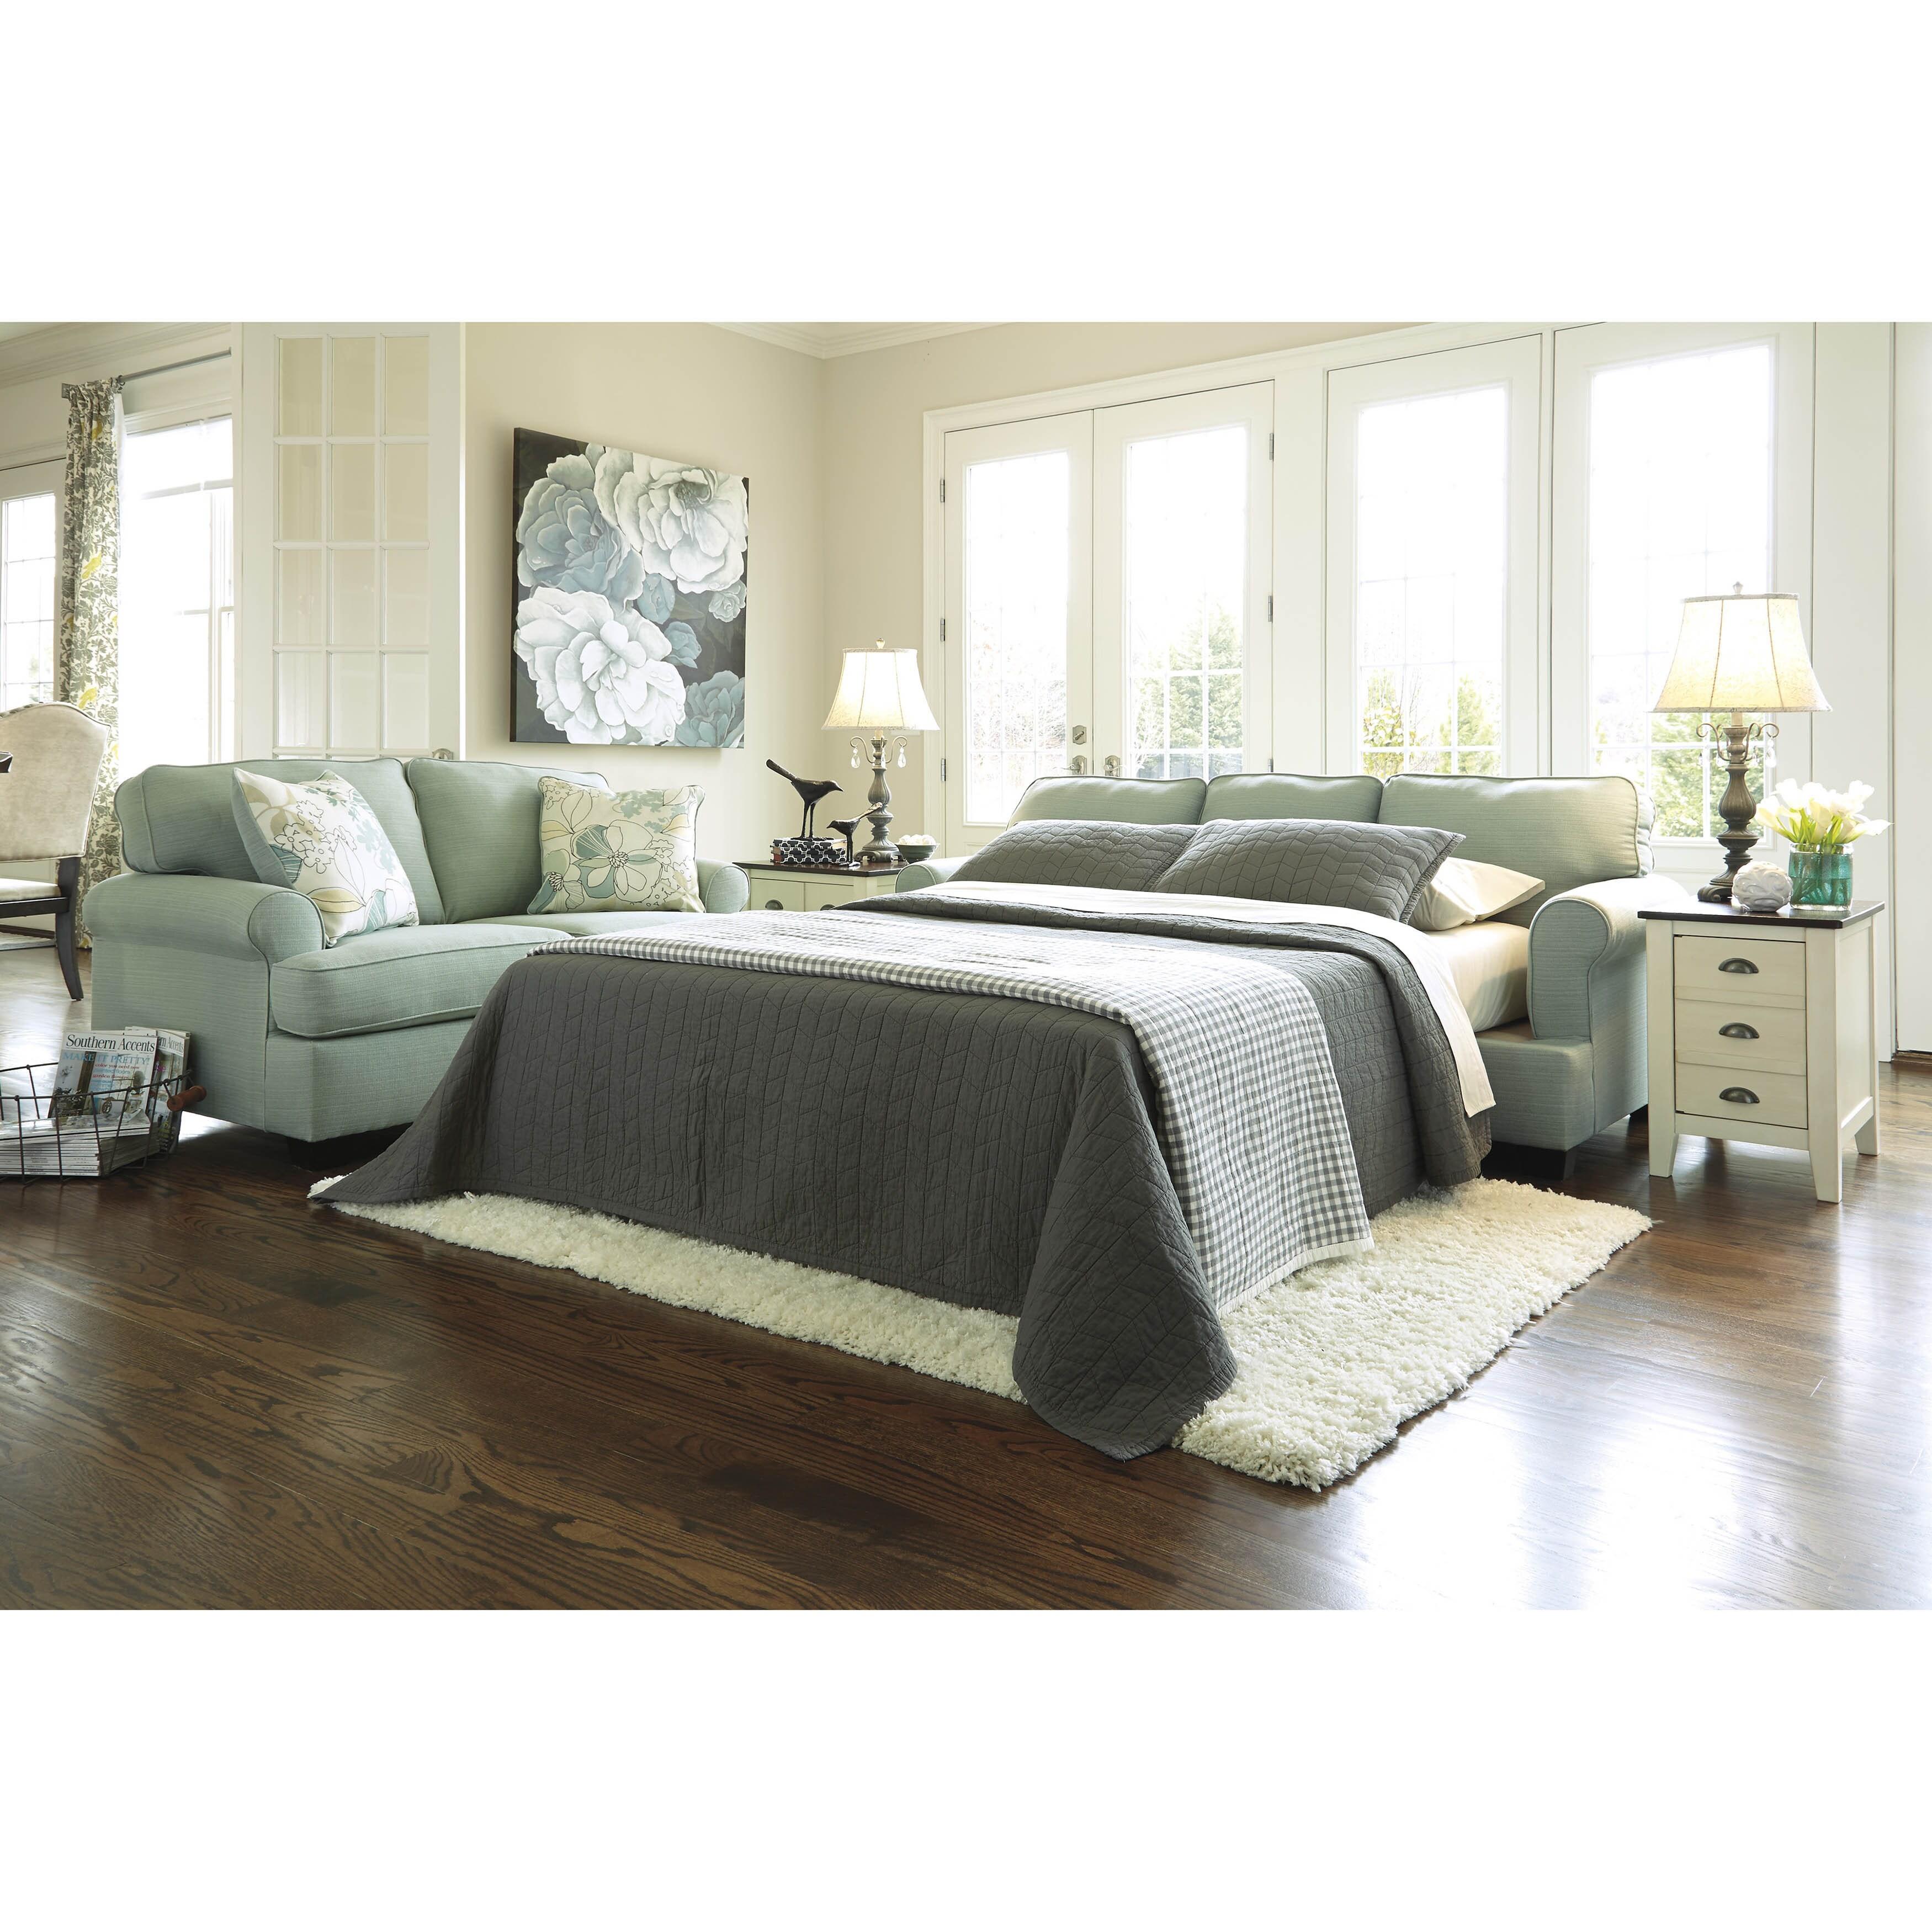 Surprising Signature Design By Ashley Daystar Seafoam Queen Sofa Sleeper Cjindustries Chair Design For Home Cjindustriesco